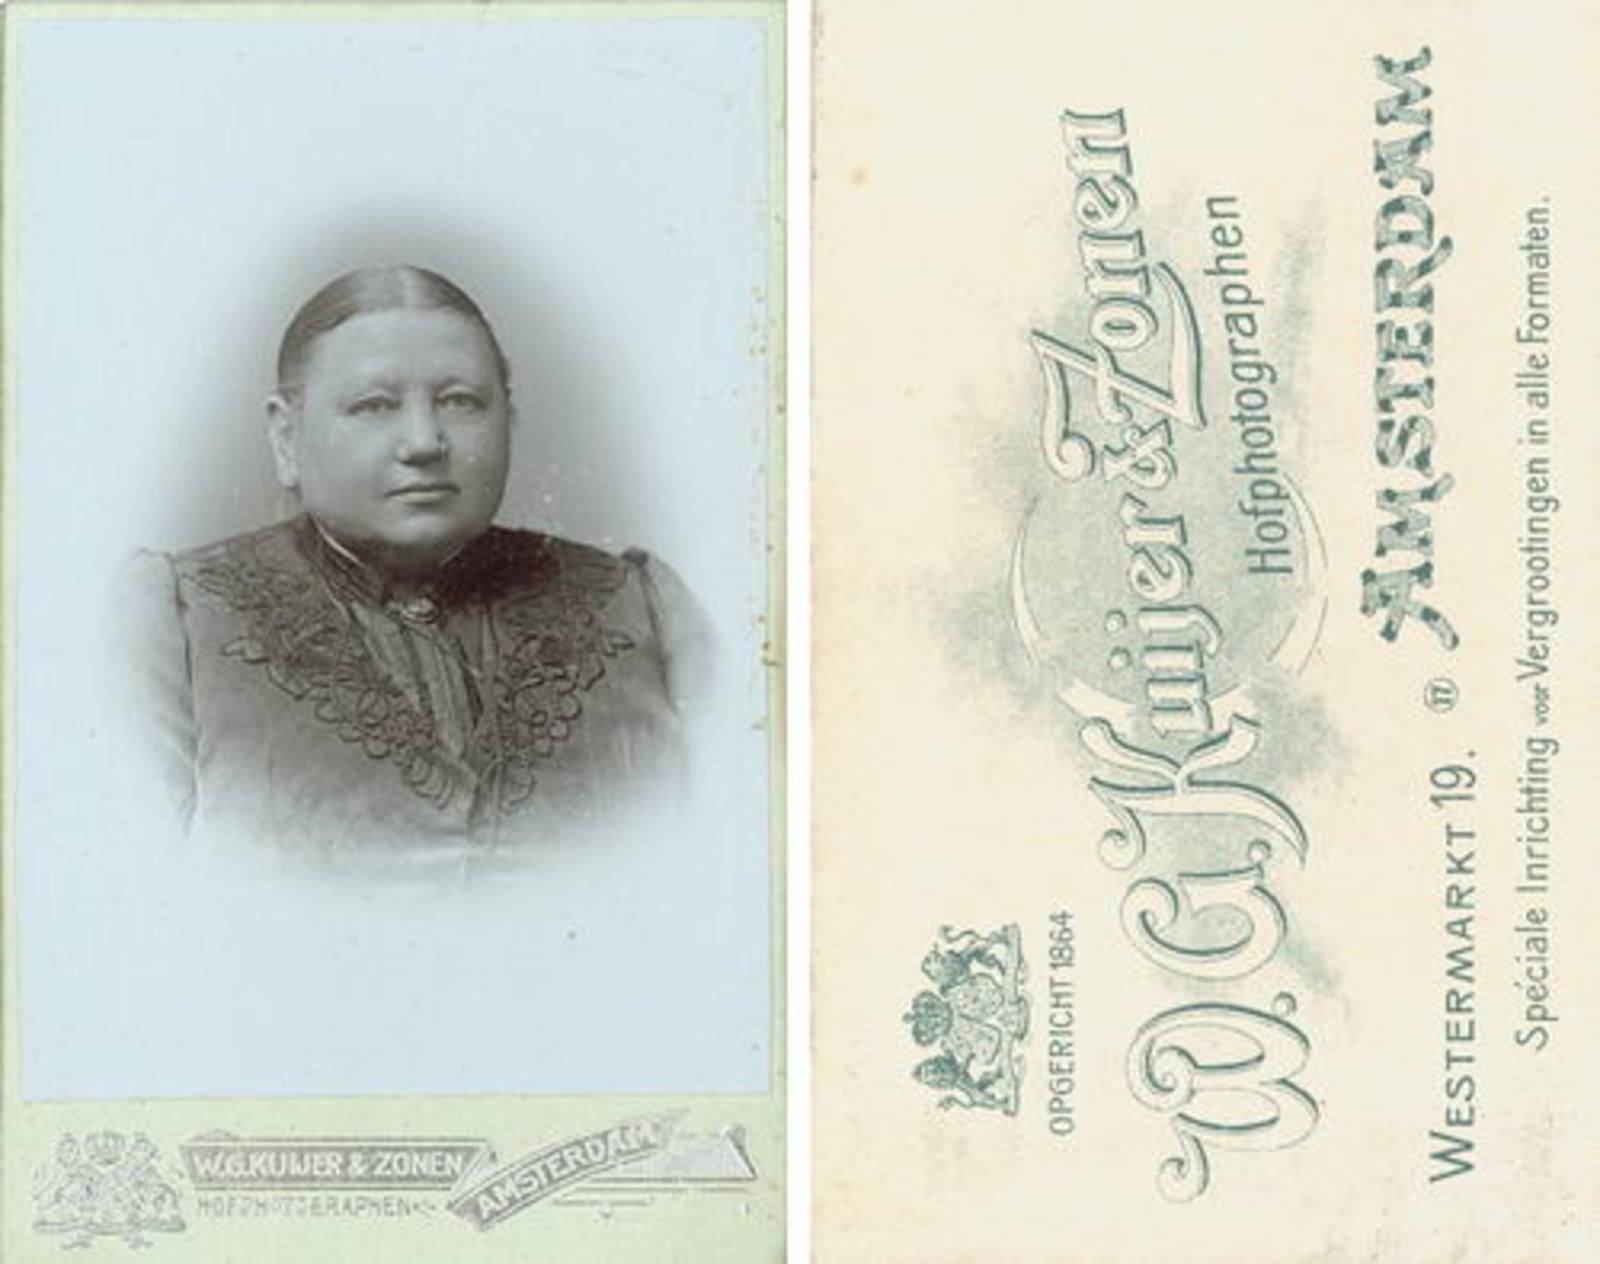 Biesheuvel Barend Wzn 1832 1915 2e vrouw Bertha Wamsteker Portret